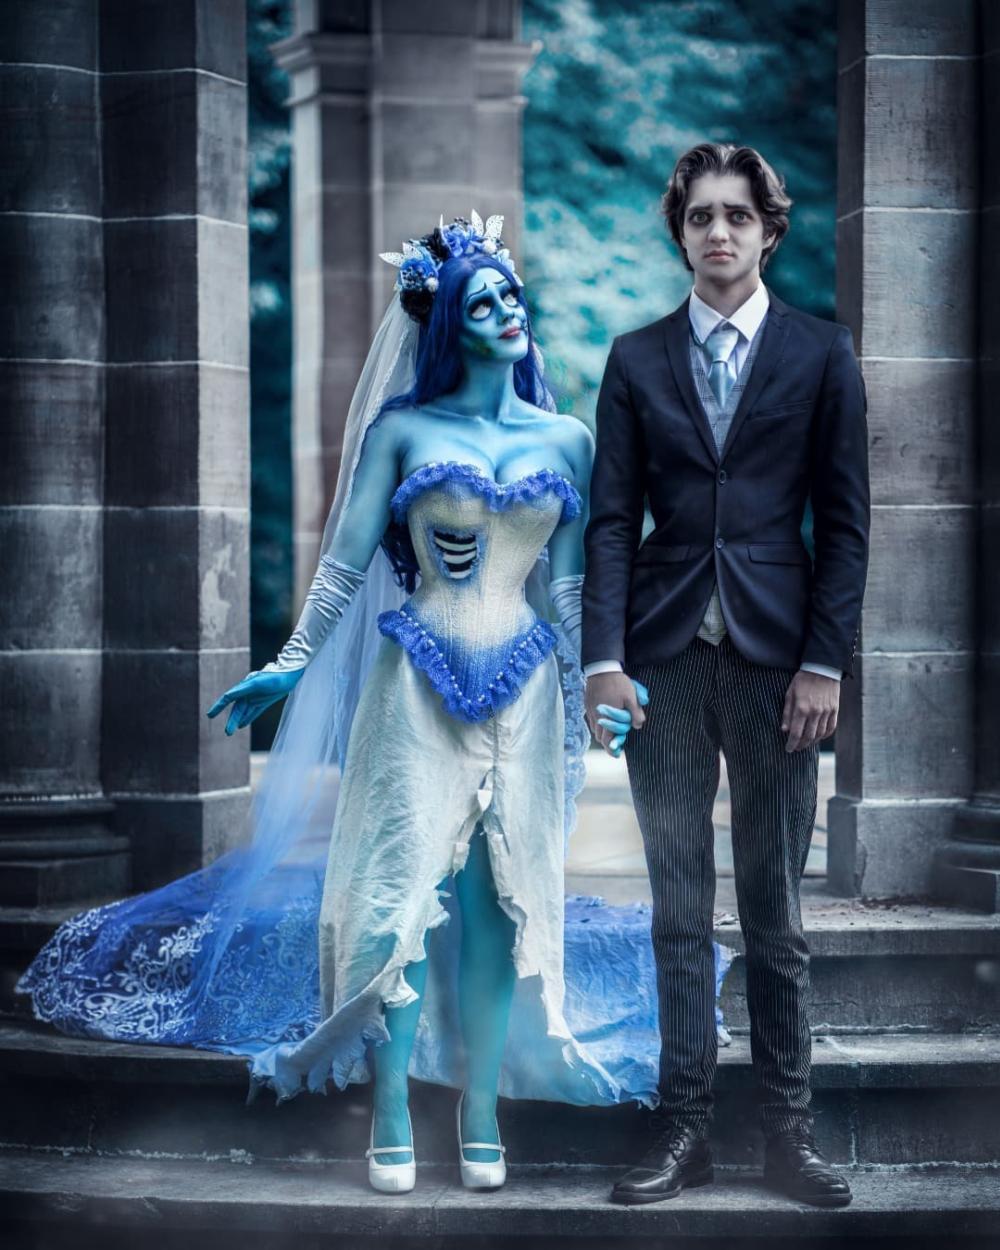 Couples halloween costume corpse bride and husband cosplay